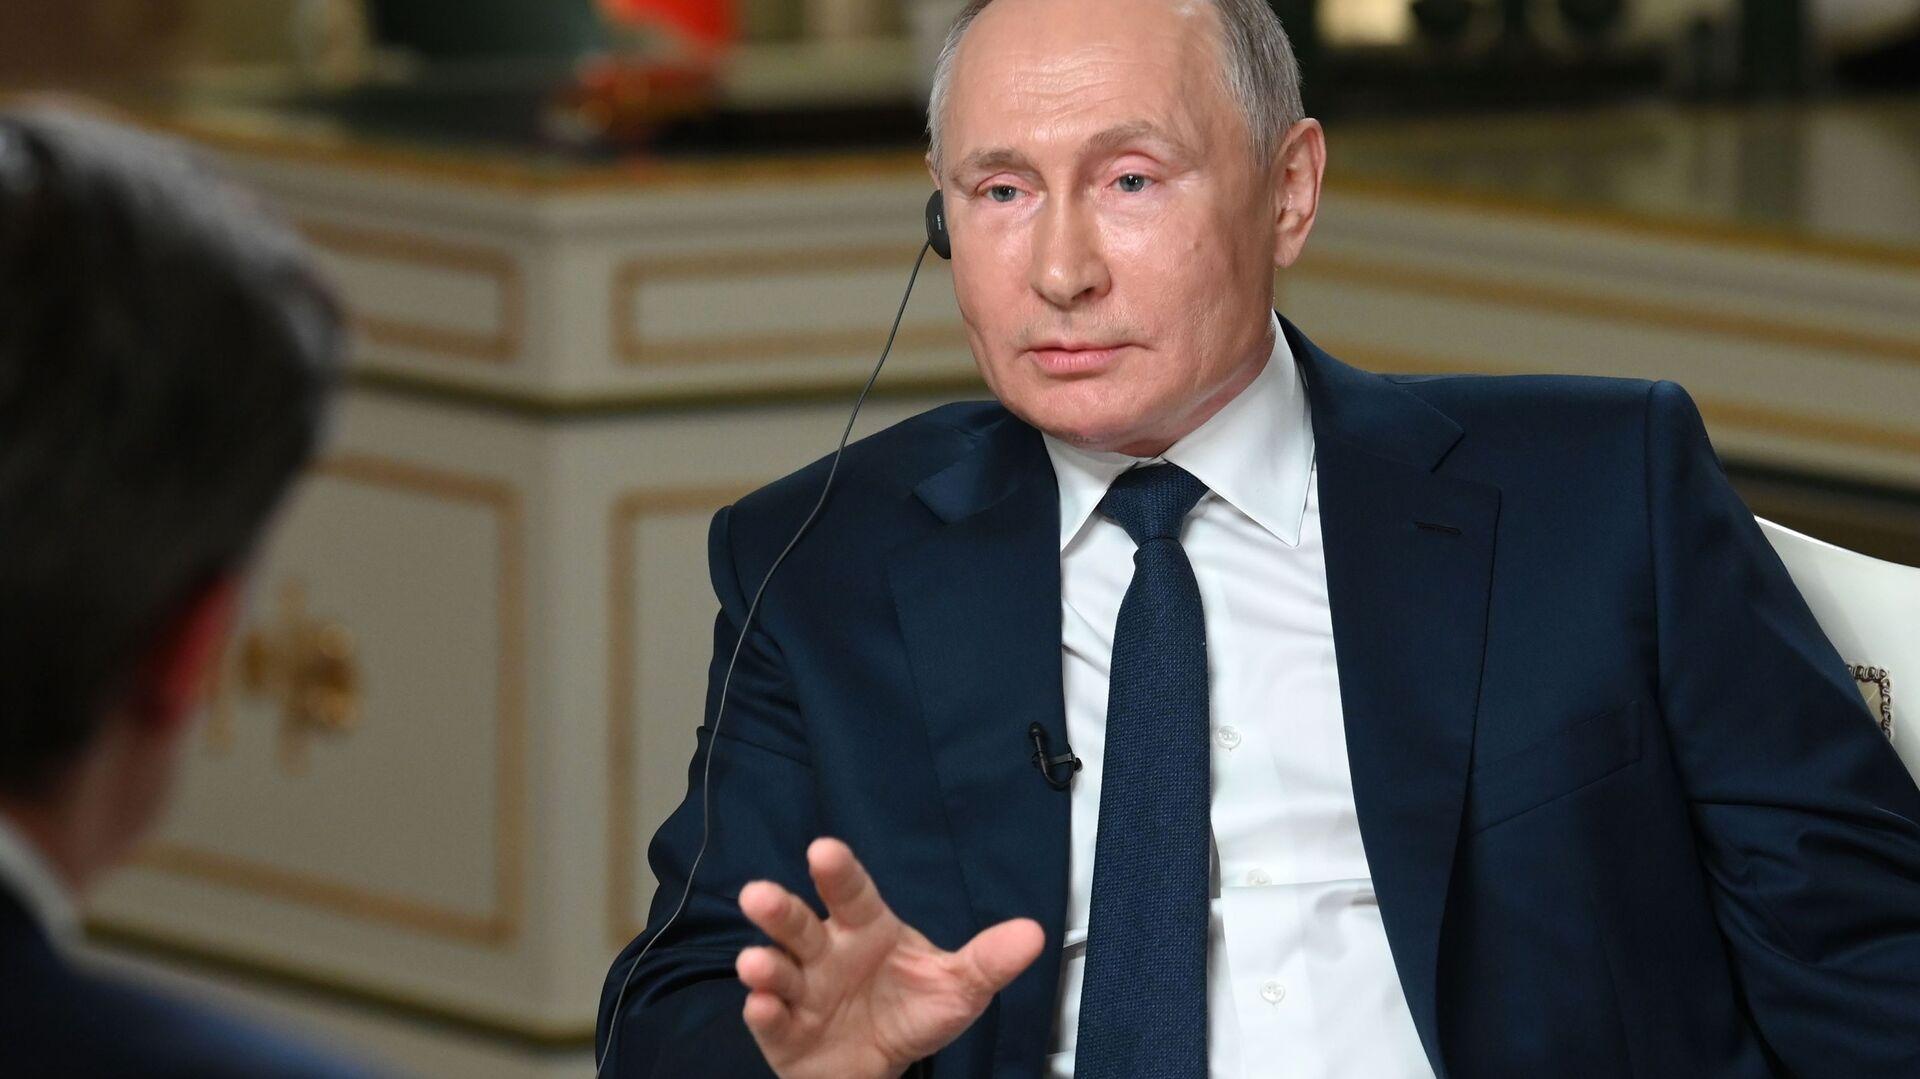 Russian President Vladimir Putin gives an interview to NBC at Moscow's Kremlin, Russia - Sputnik International, 1920, 15.09.2021